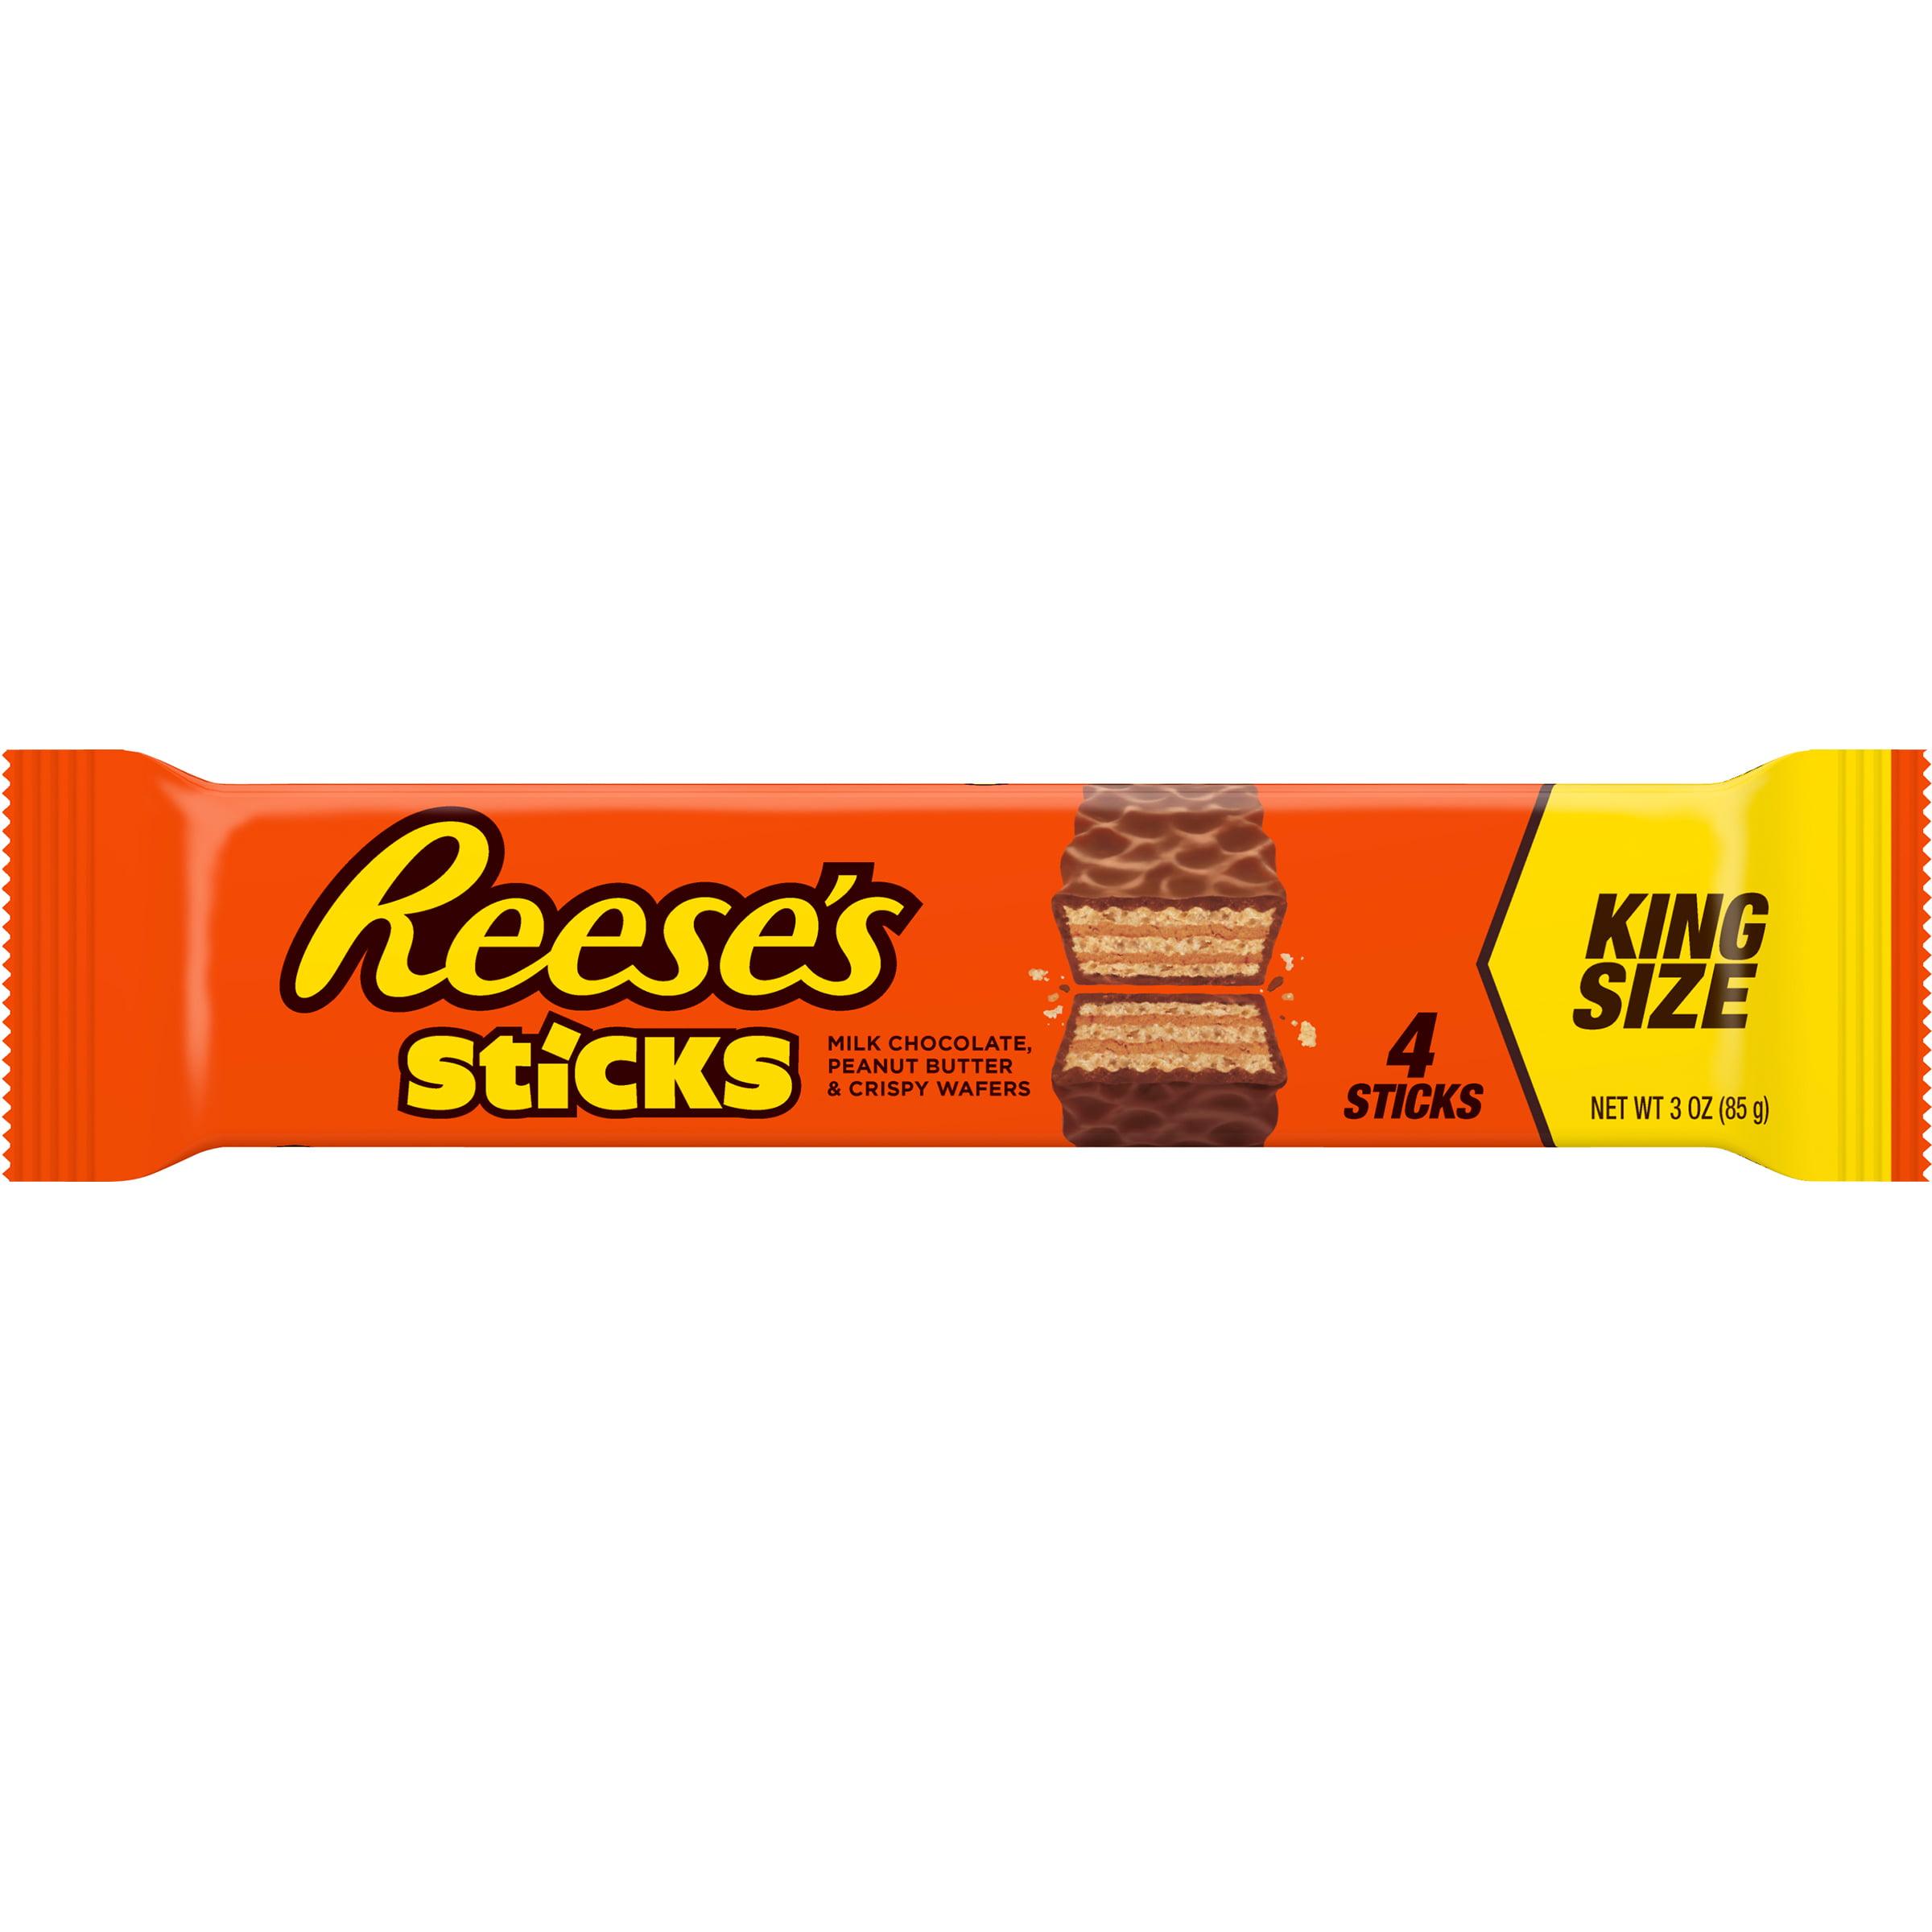 Reese's Sticks, Peanut Butter Milk Chocolate King Size Candy Bar, 3 Oz